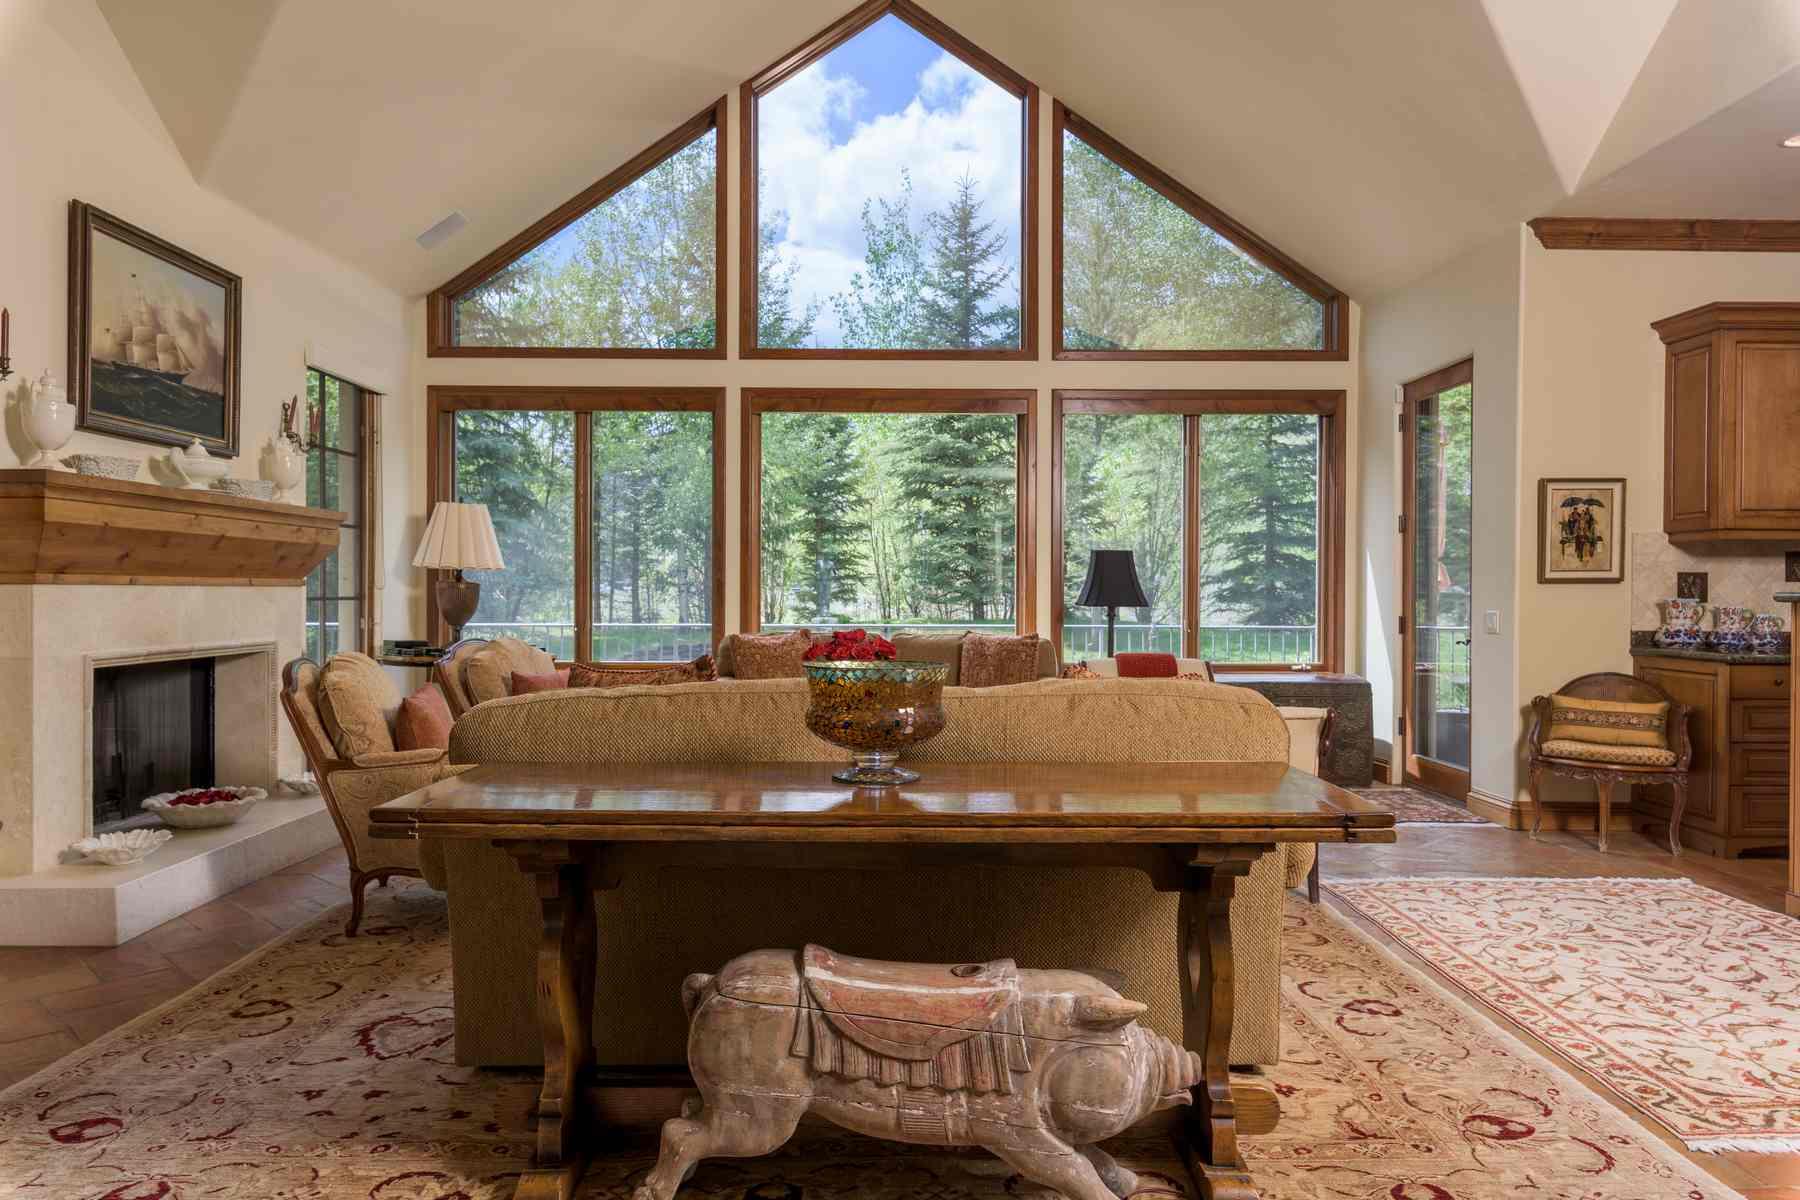 独户住宅 为 销售 在 Rarely Available Estate Caliber Home 1100 W Canyon Run Blvd. 凯彻姆, 爱达荷州 83340 美国